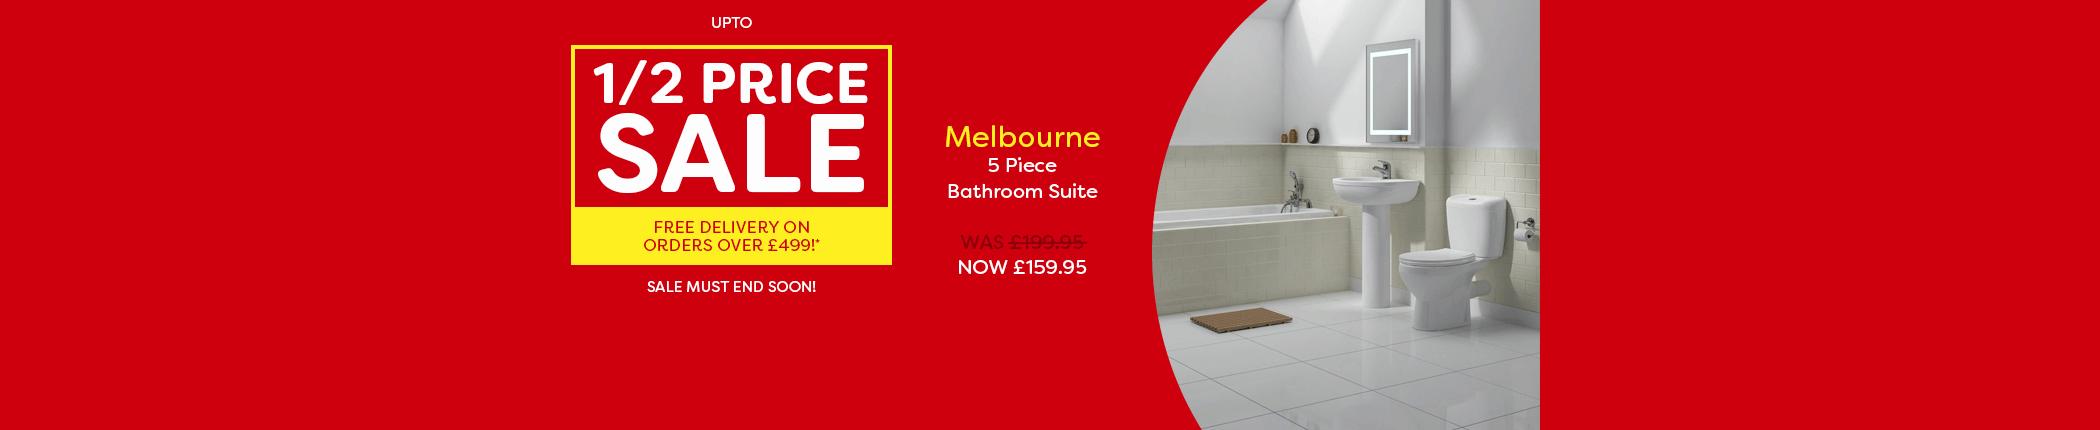 half-price-sale-melbourne-5-piece-bathroom-suite-countdown-apr17-hbnr